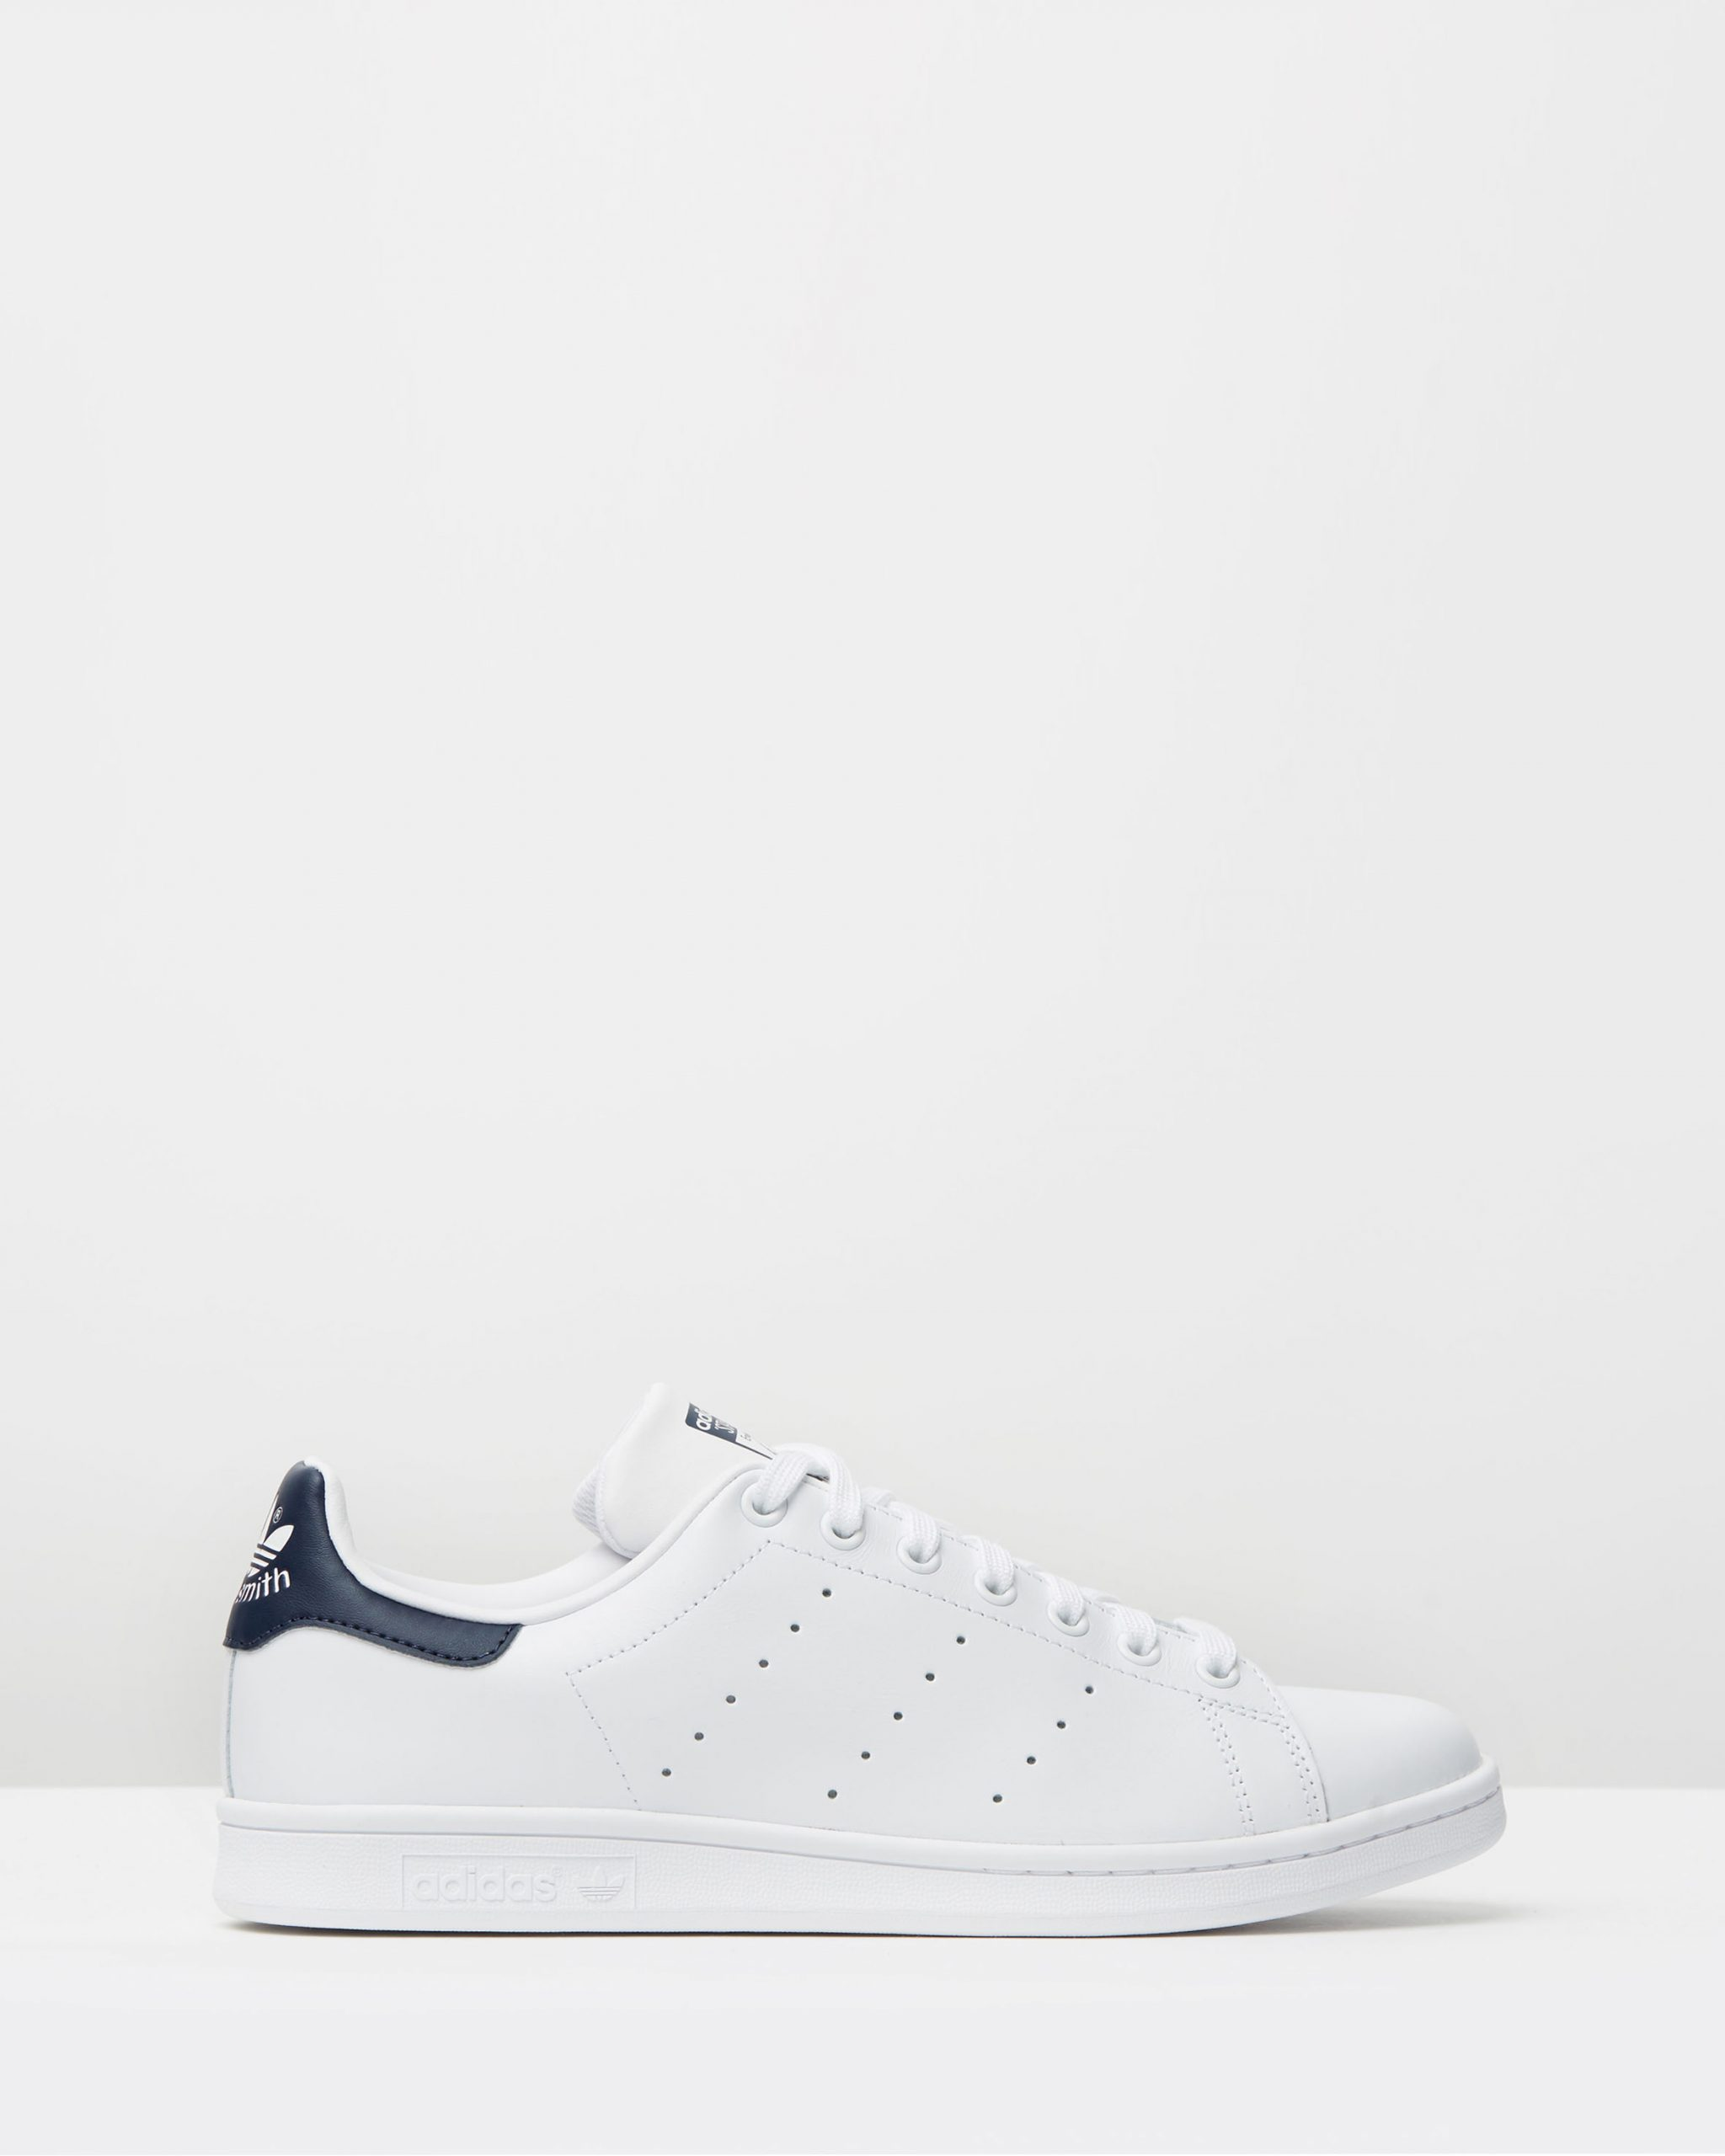 Adidas Men's Stan Smith Navy